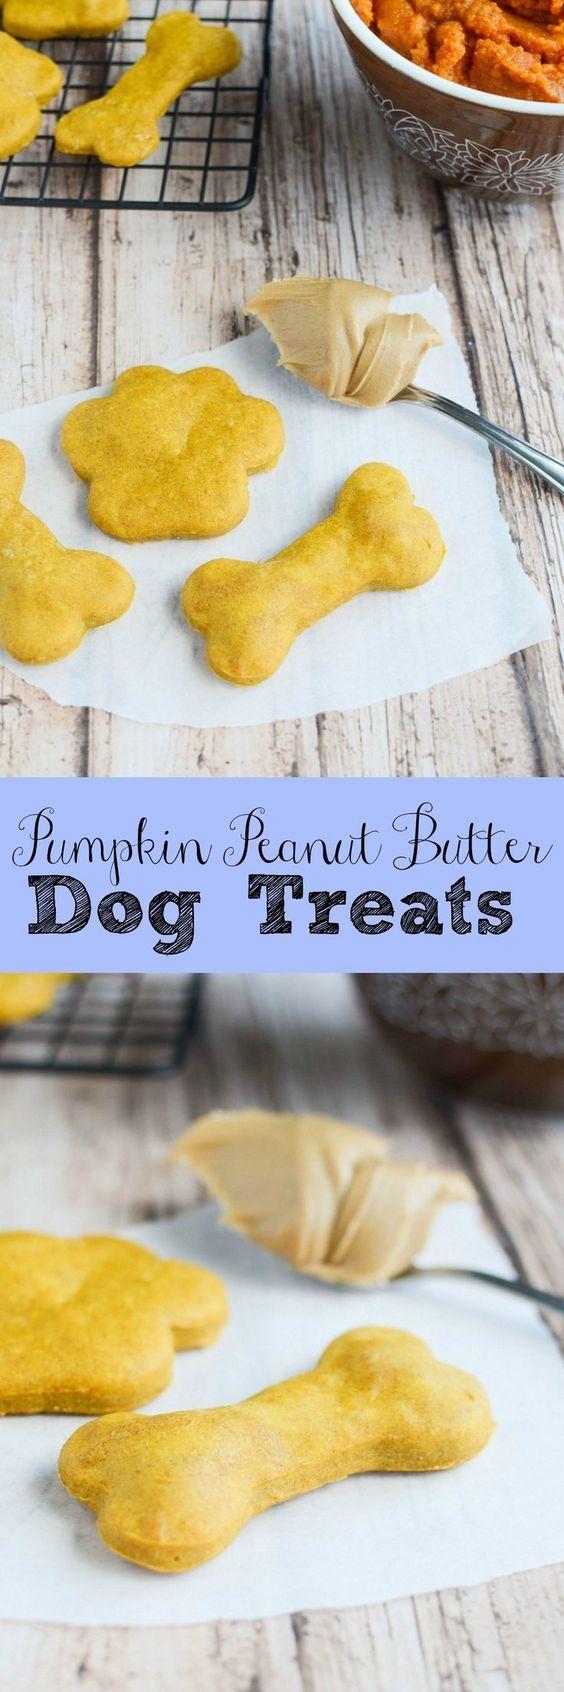 Pumpkin Peanut Butter Dog Treats - your pups will love these homemade dog treats!: http://fakeginger.com/pumpkin-peanut-butter-dog-treats/